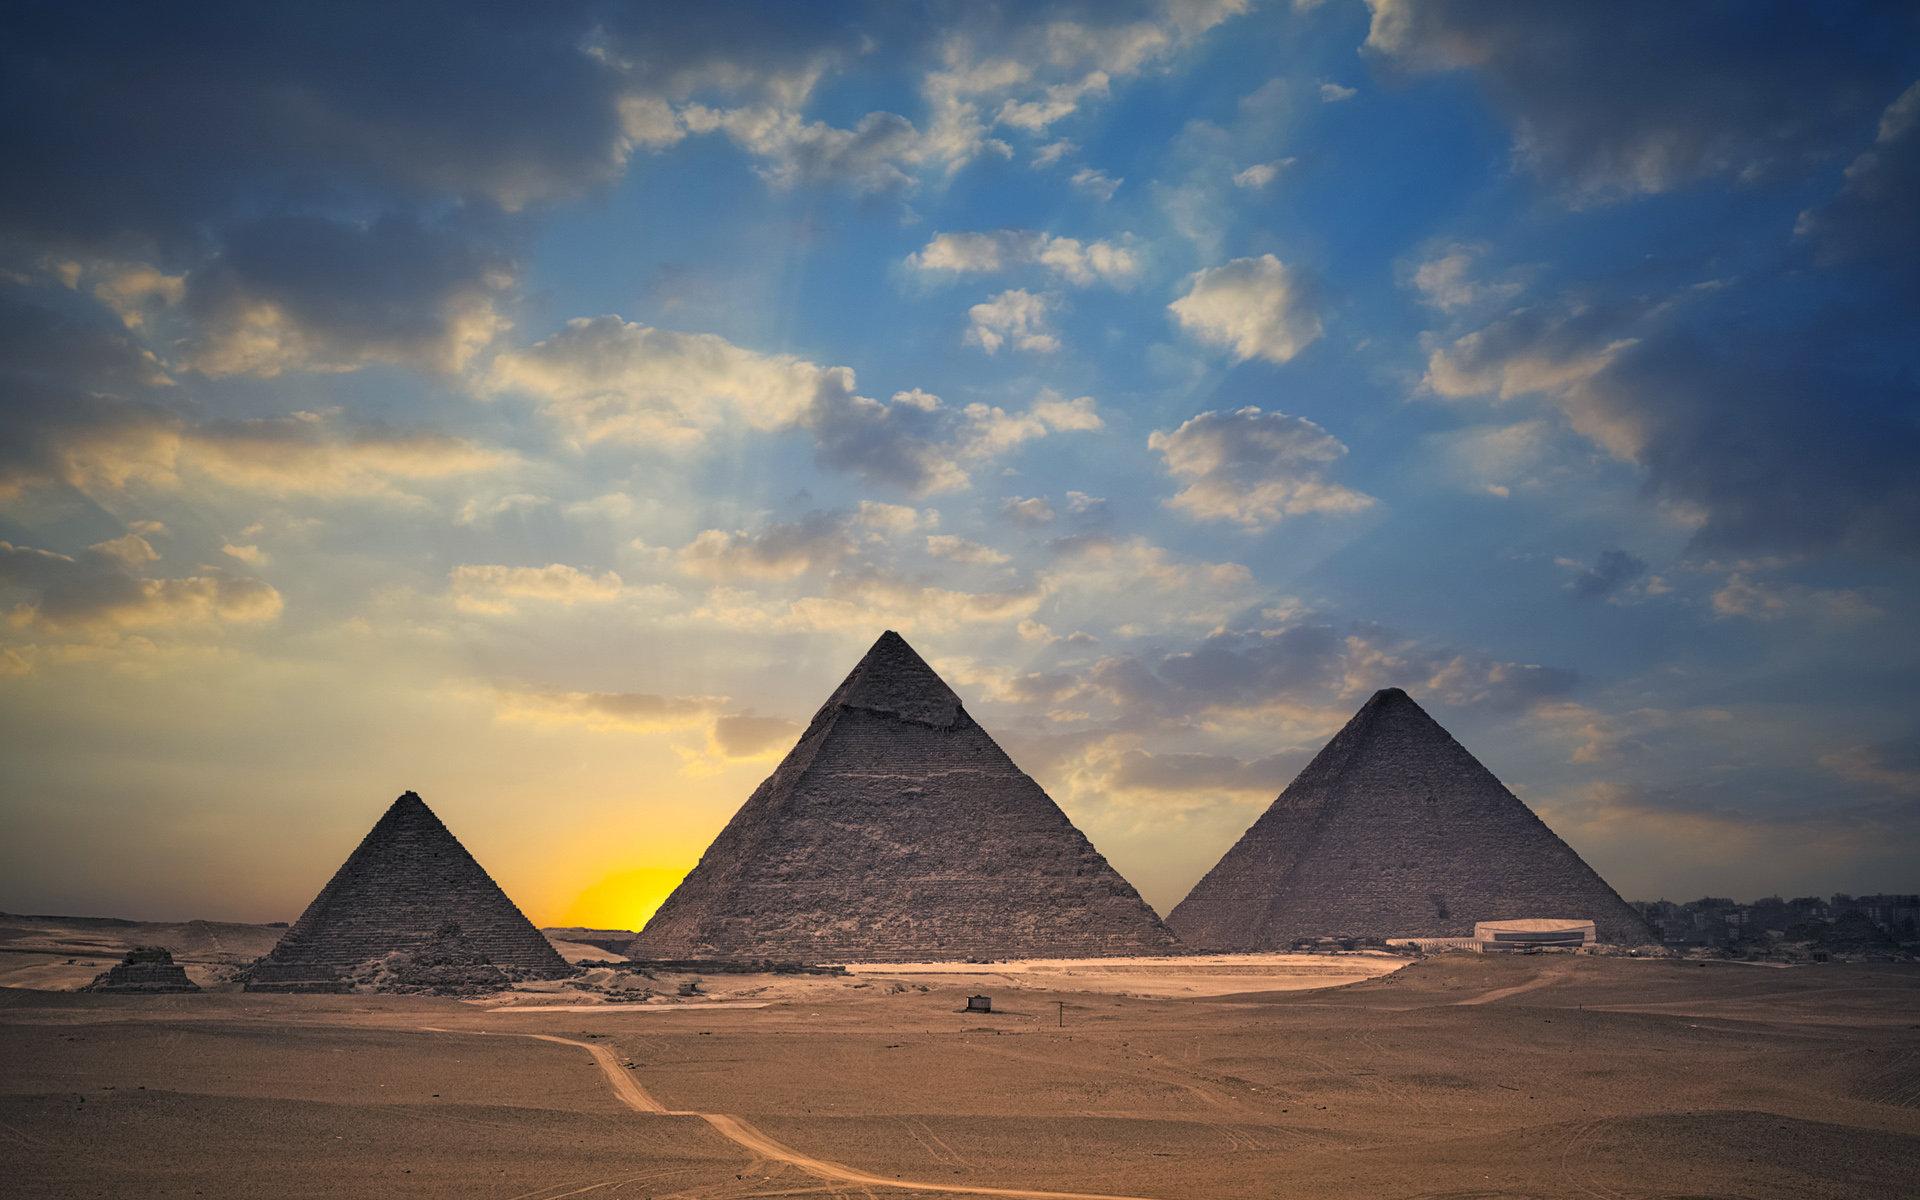 Pyramids of Giza at sunset, Cairo, Egypt